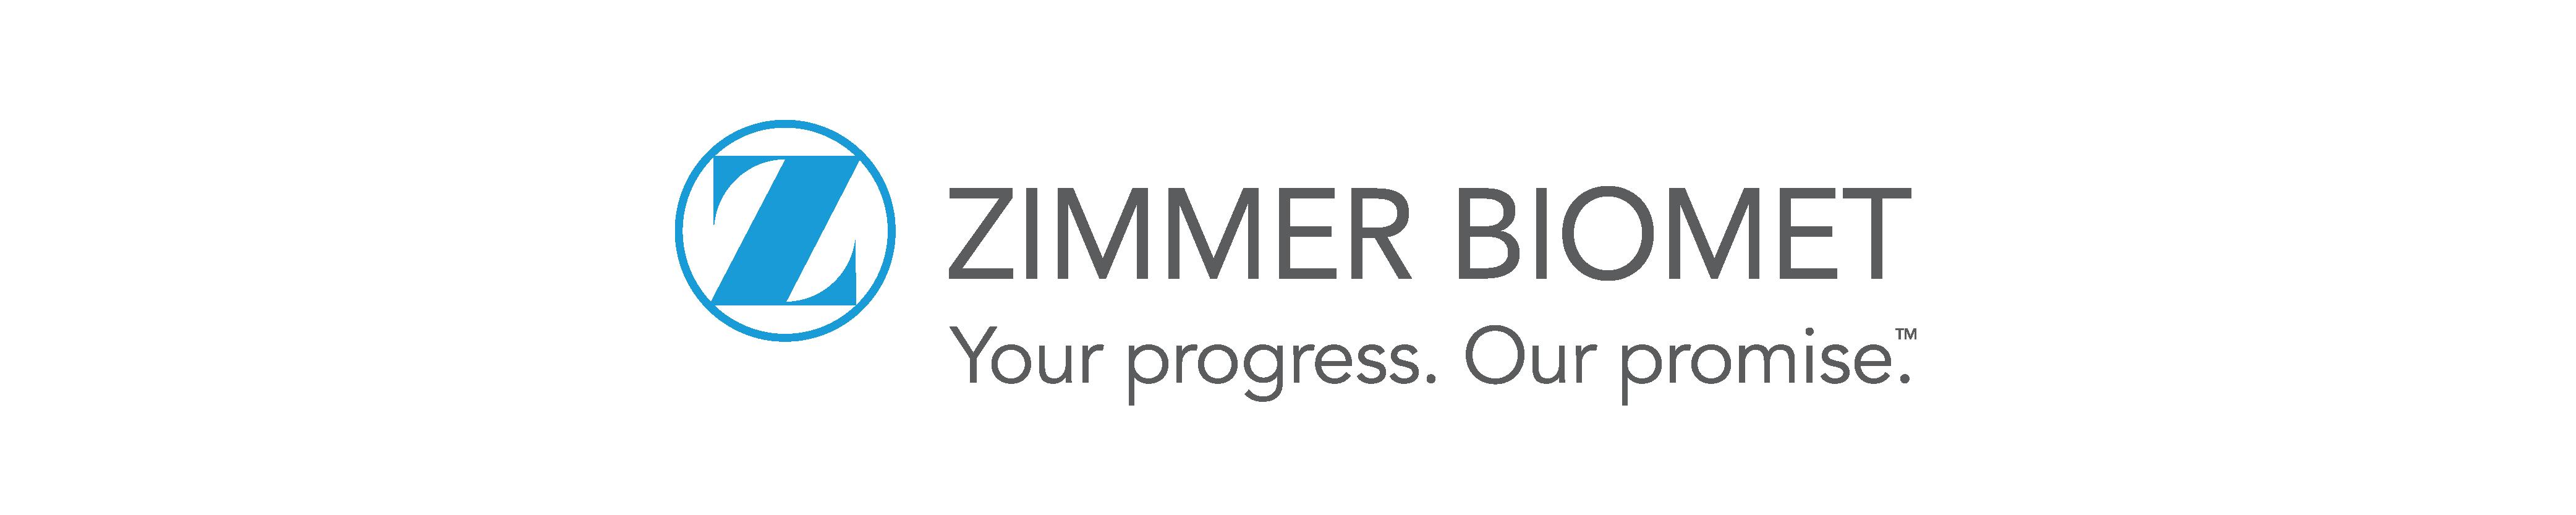 zimmer-biomet-logo-artrolife-01